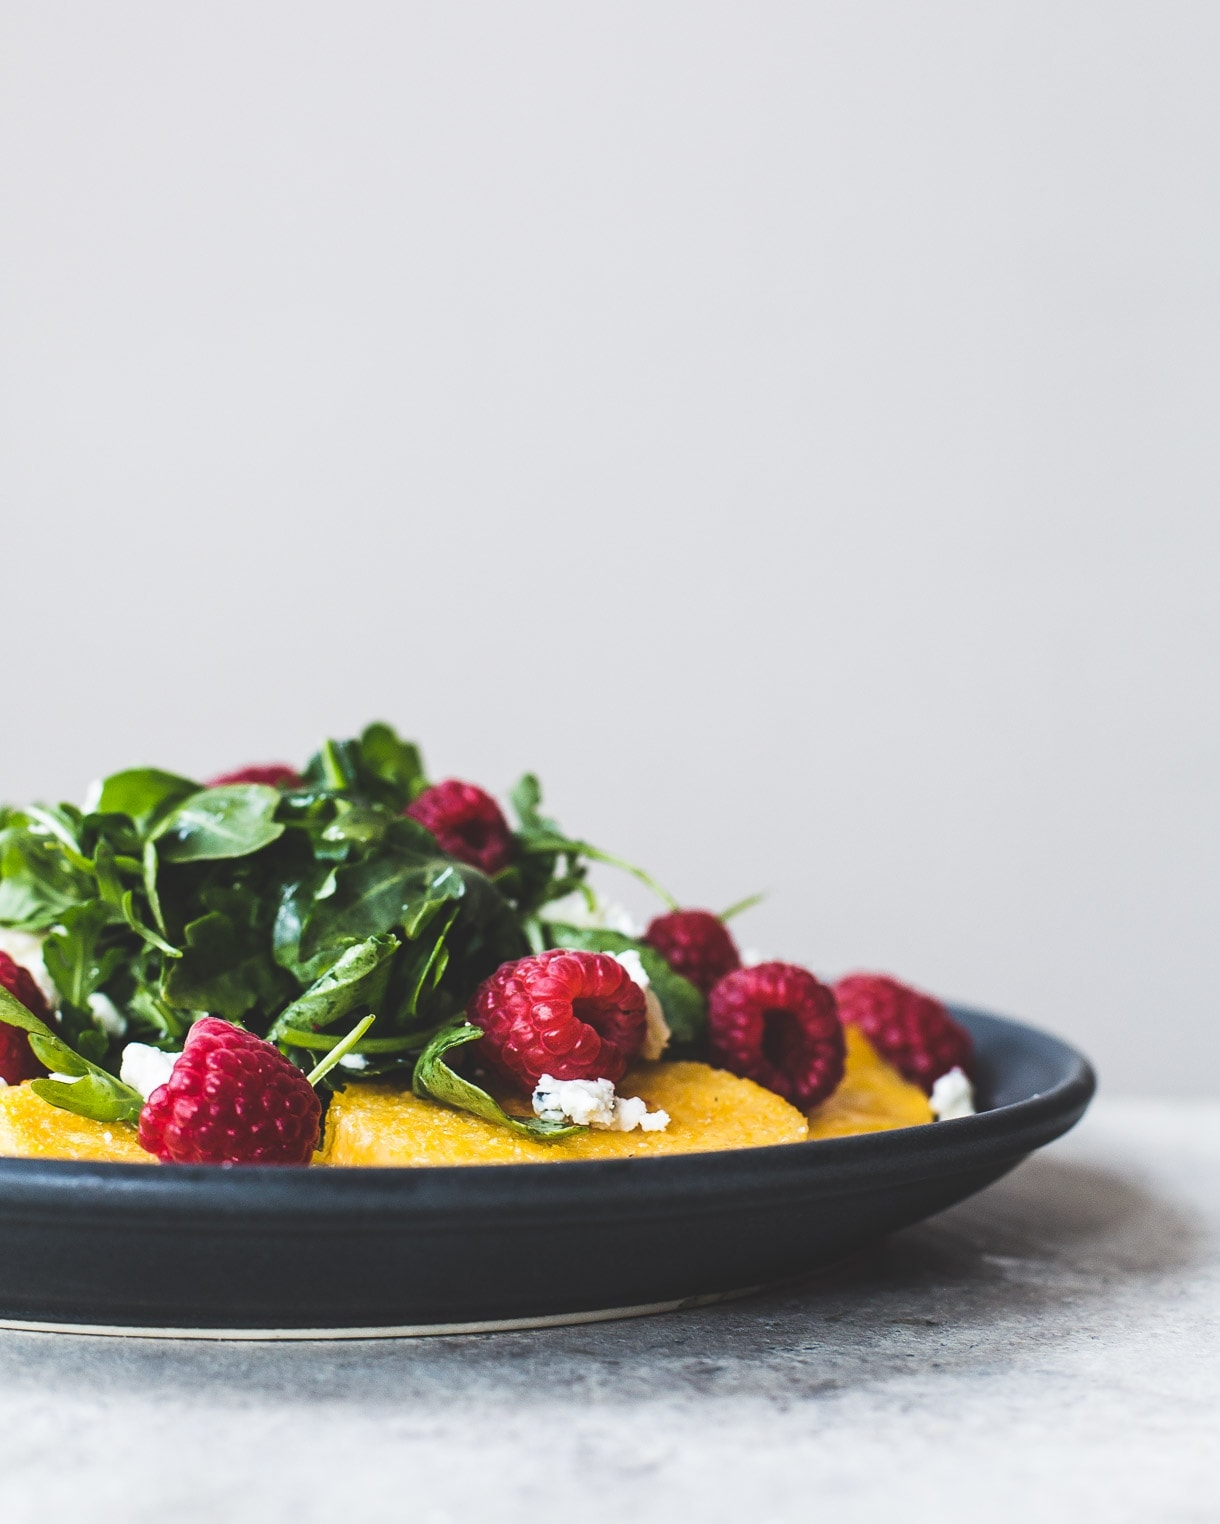 Raspberry Arugula Polenta Salad {gluten-free, vegetarian recipe}